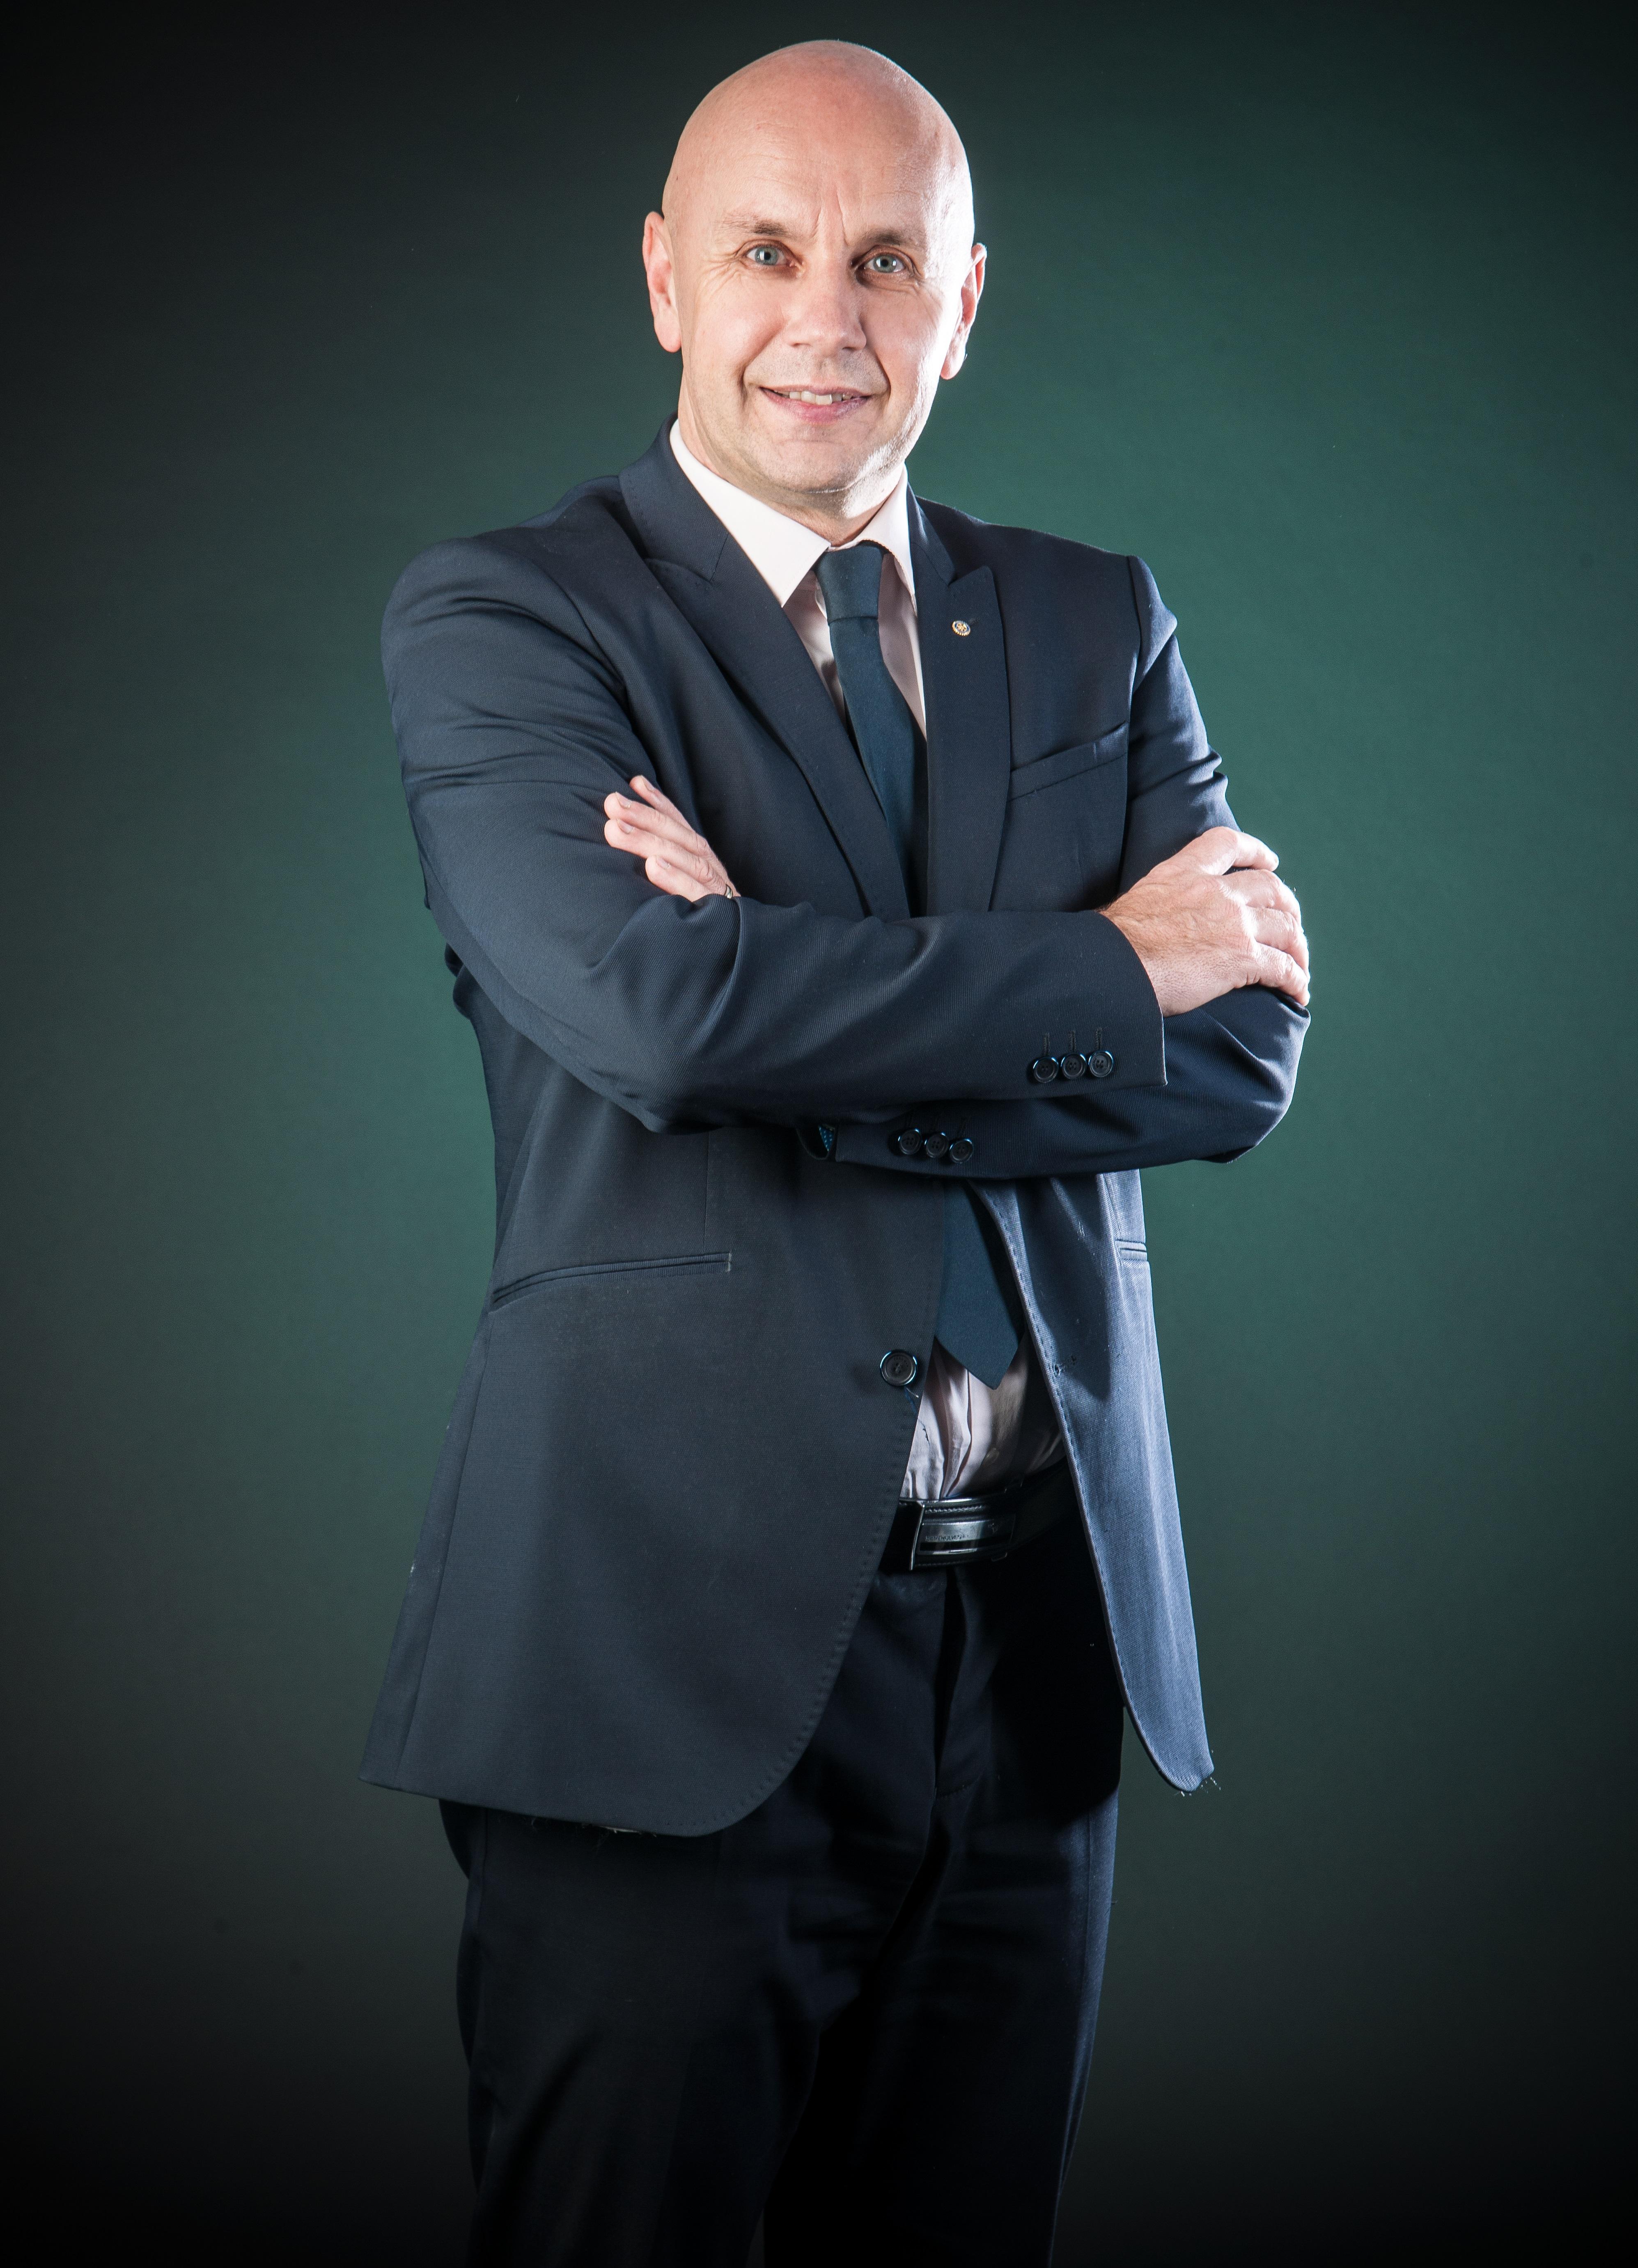 Ing. Jiří Morštadt